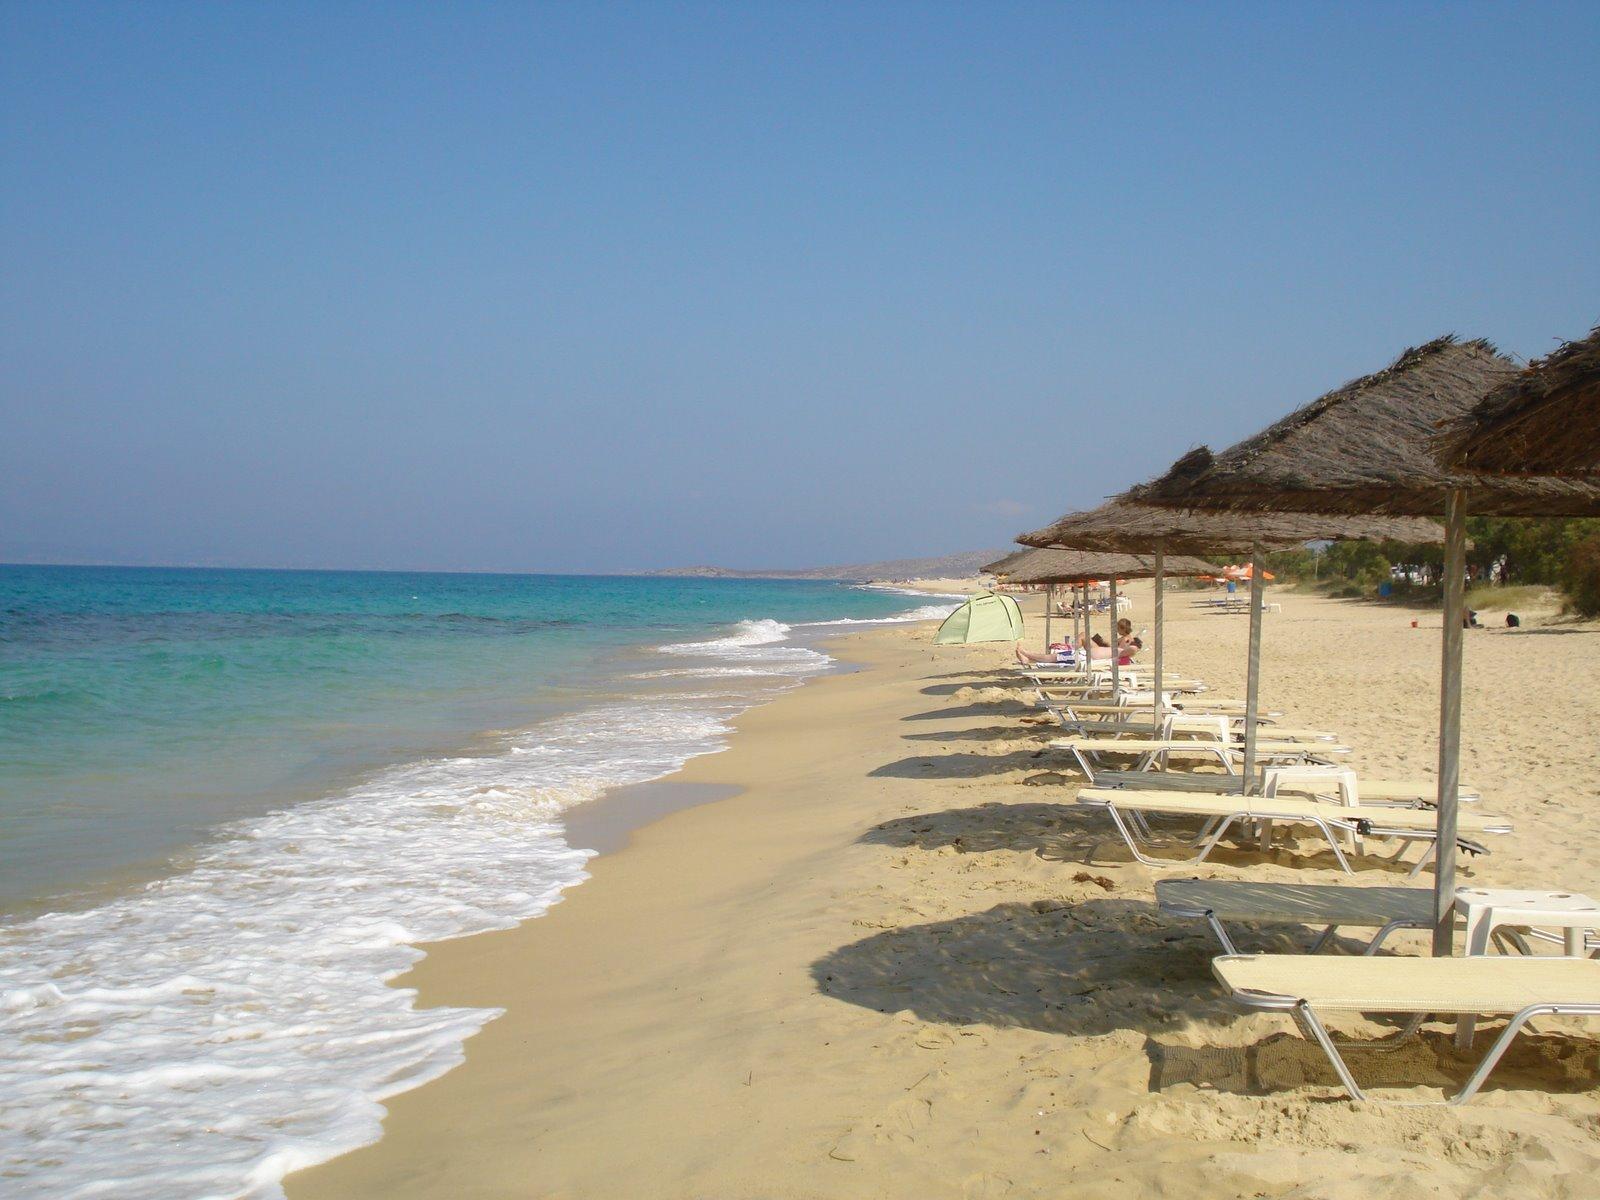 Greek Island Beaches: Travelthroughhistory: NAXOS ISLAND: SANDY BEACHES AND